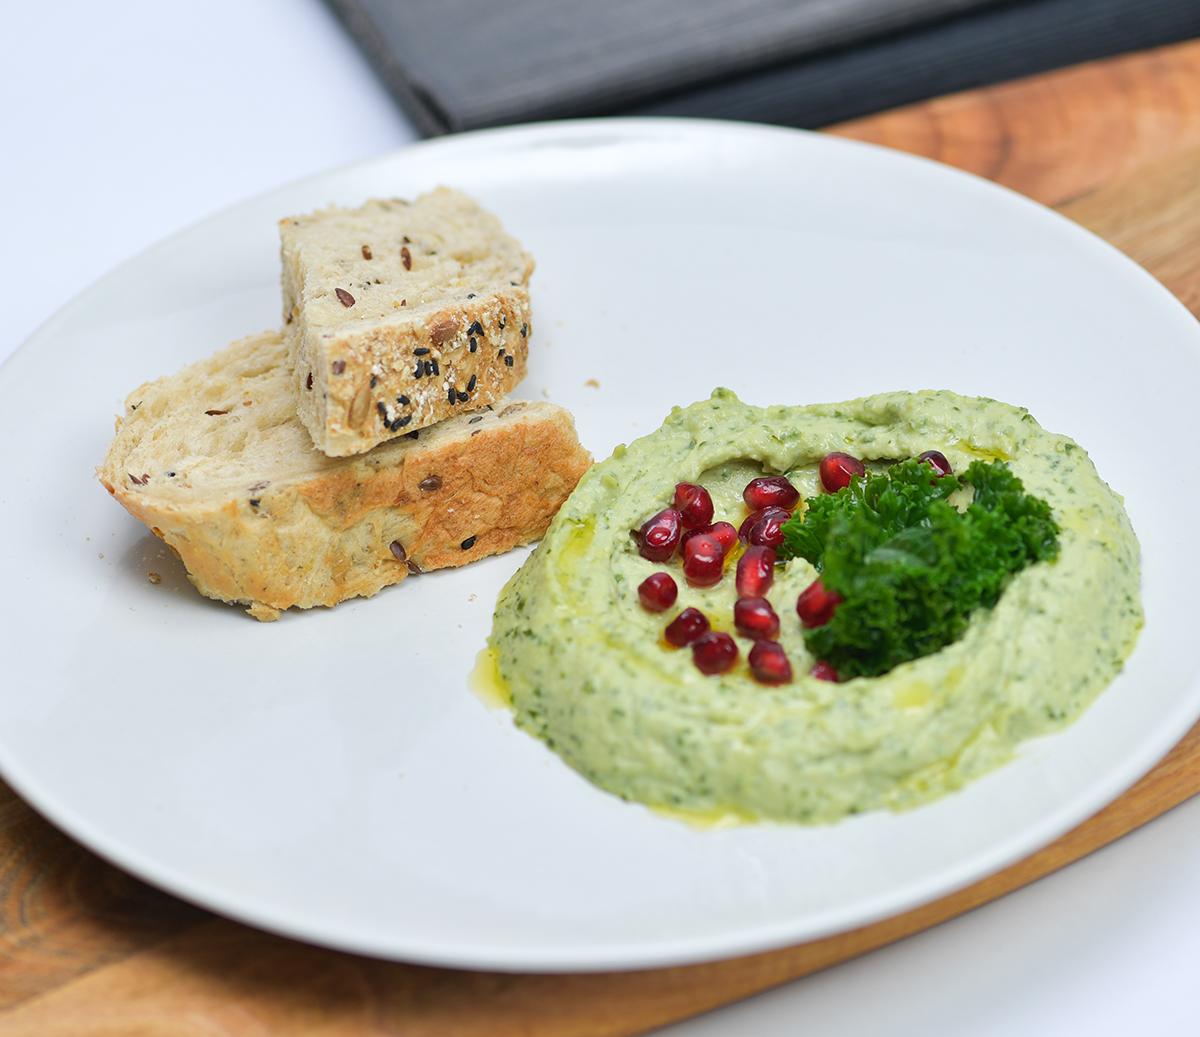 Kale Hummus Breakfast